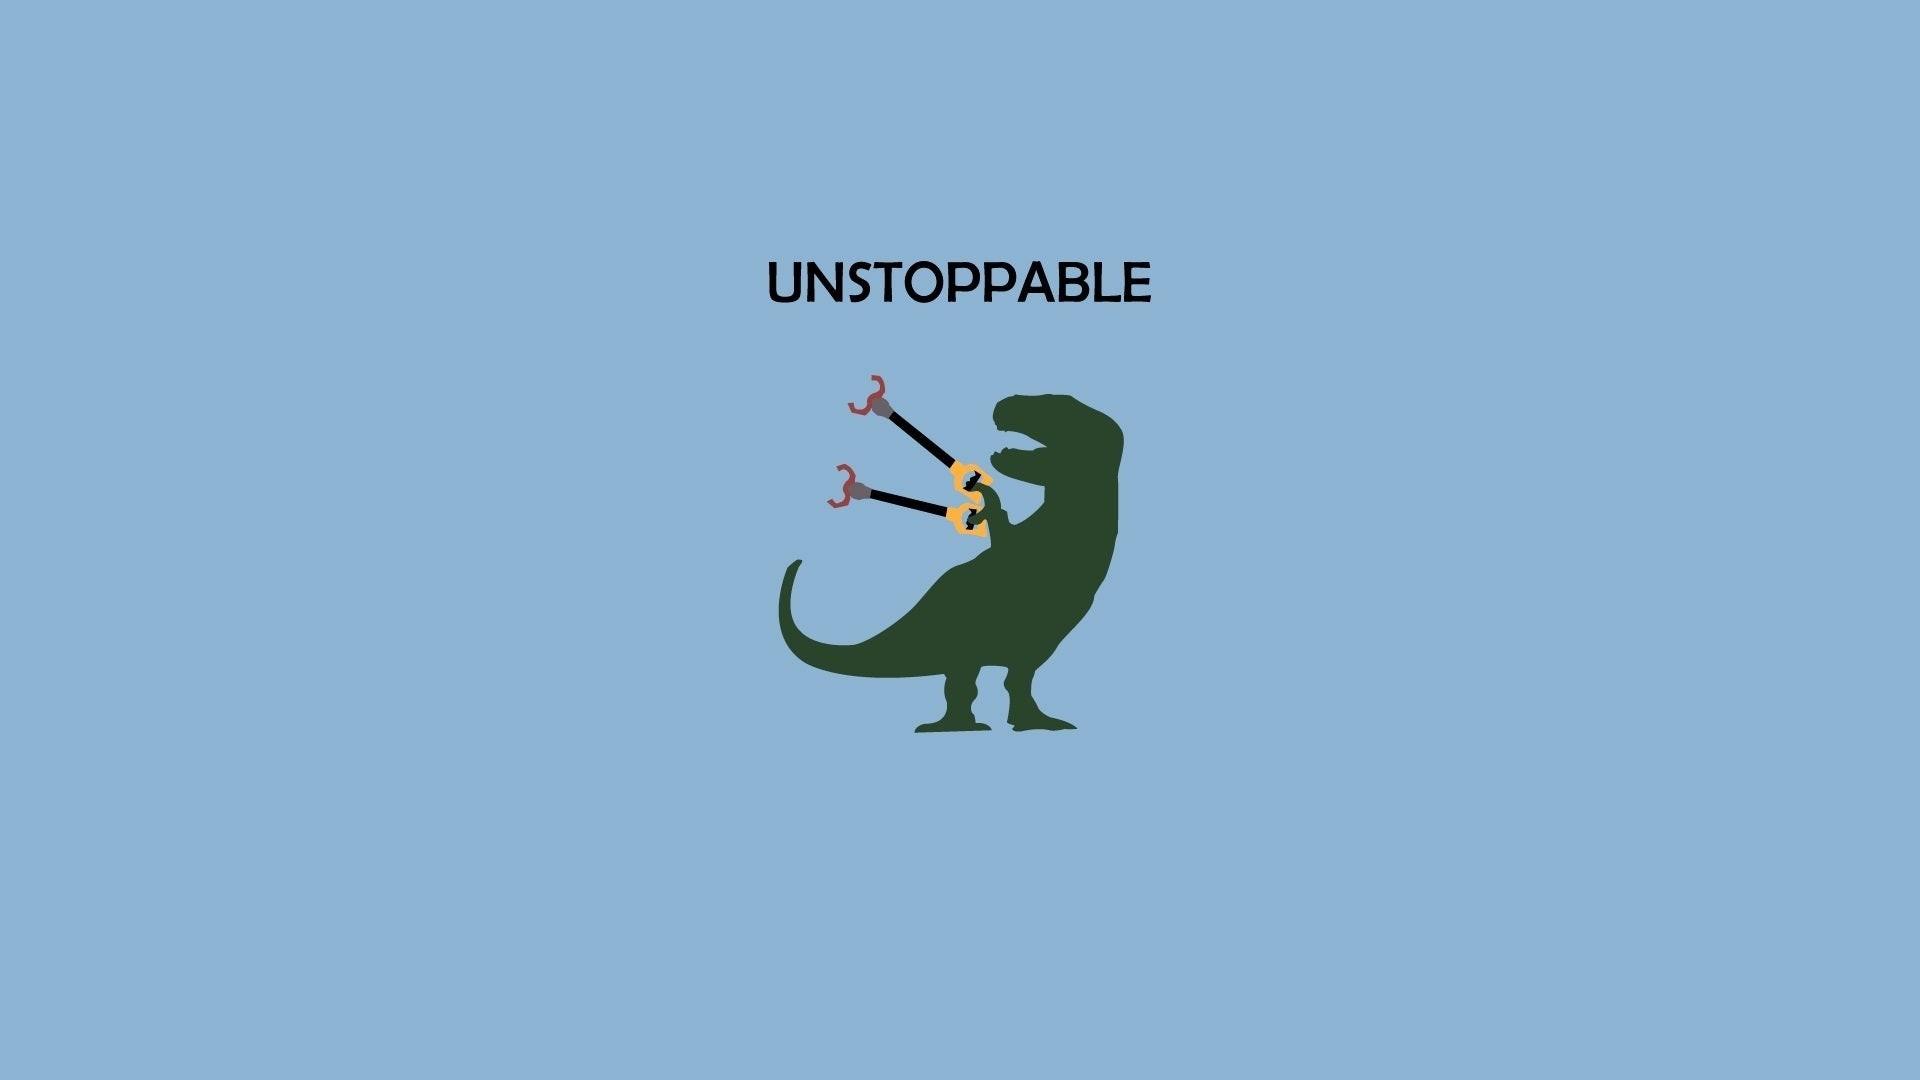 Minimalist Dinosaur Wallpaper Image